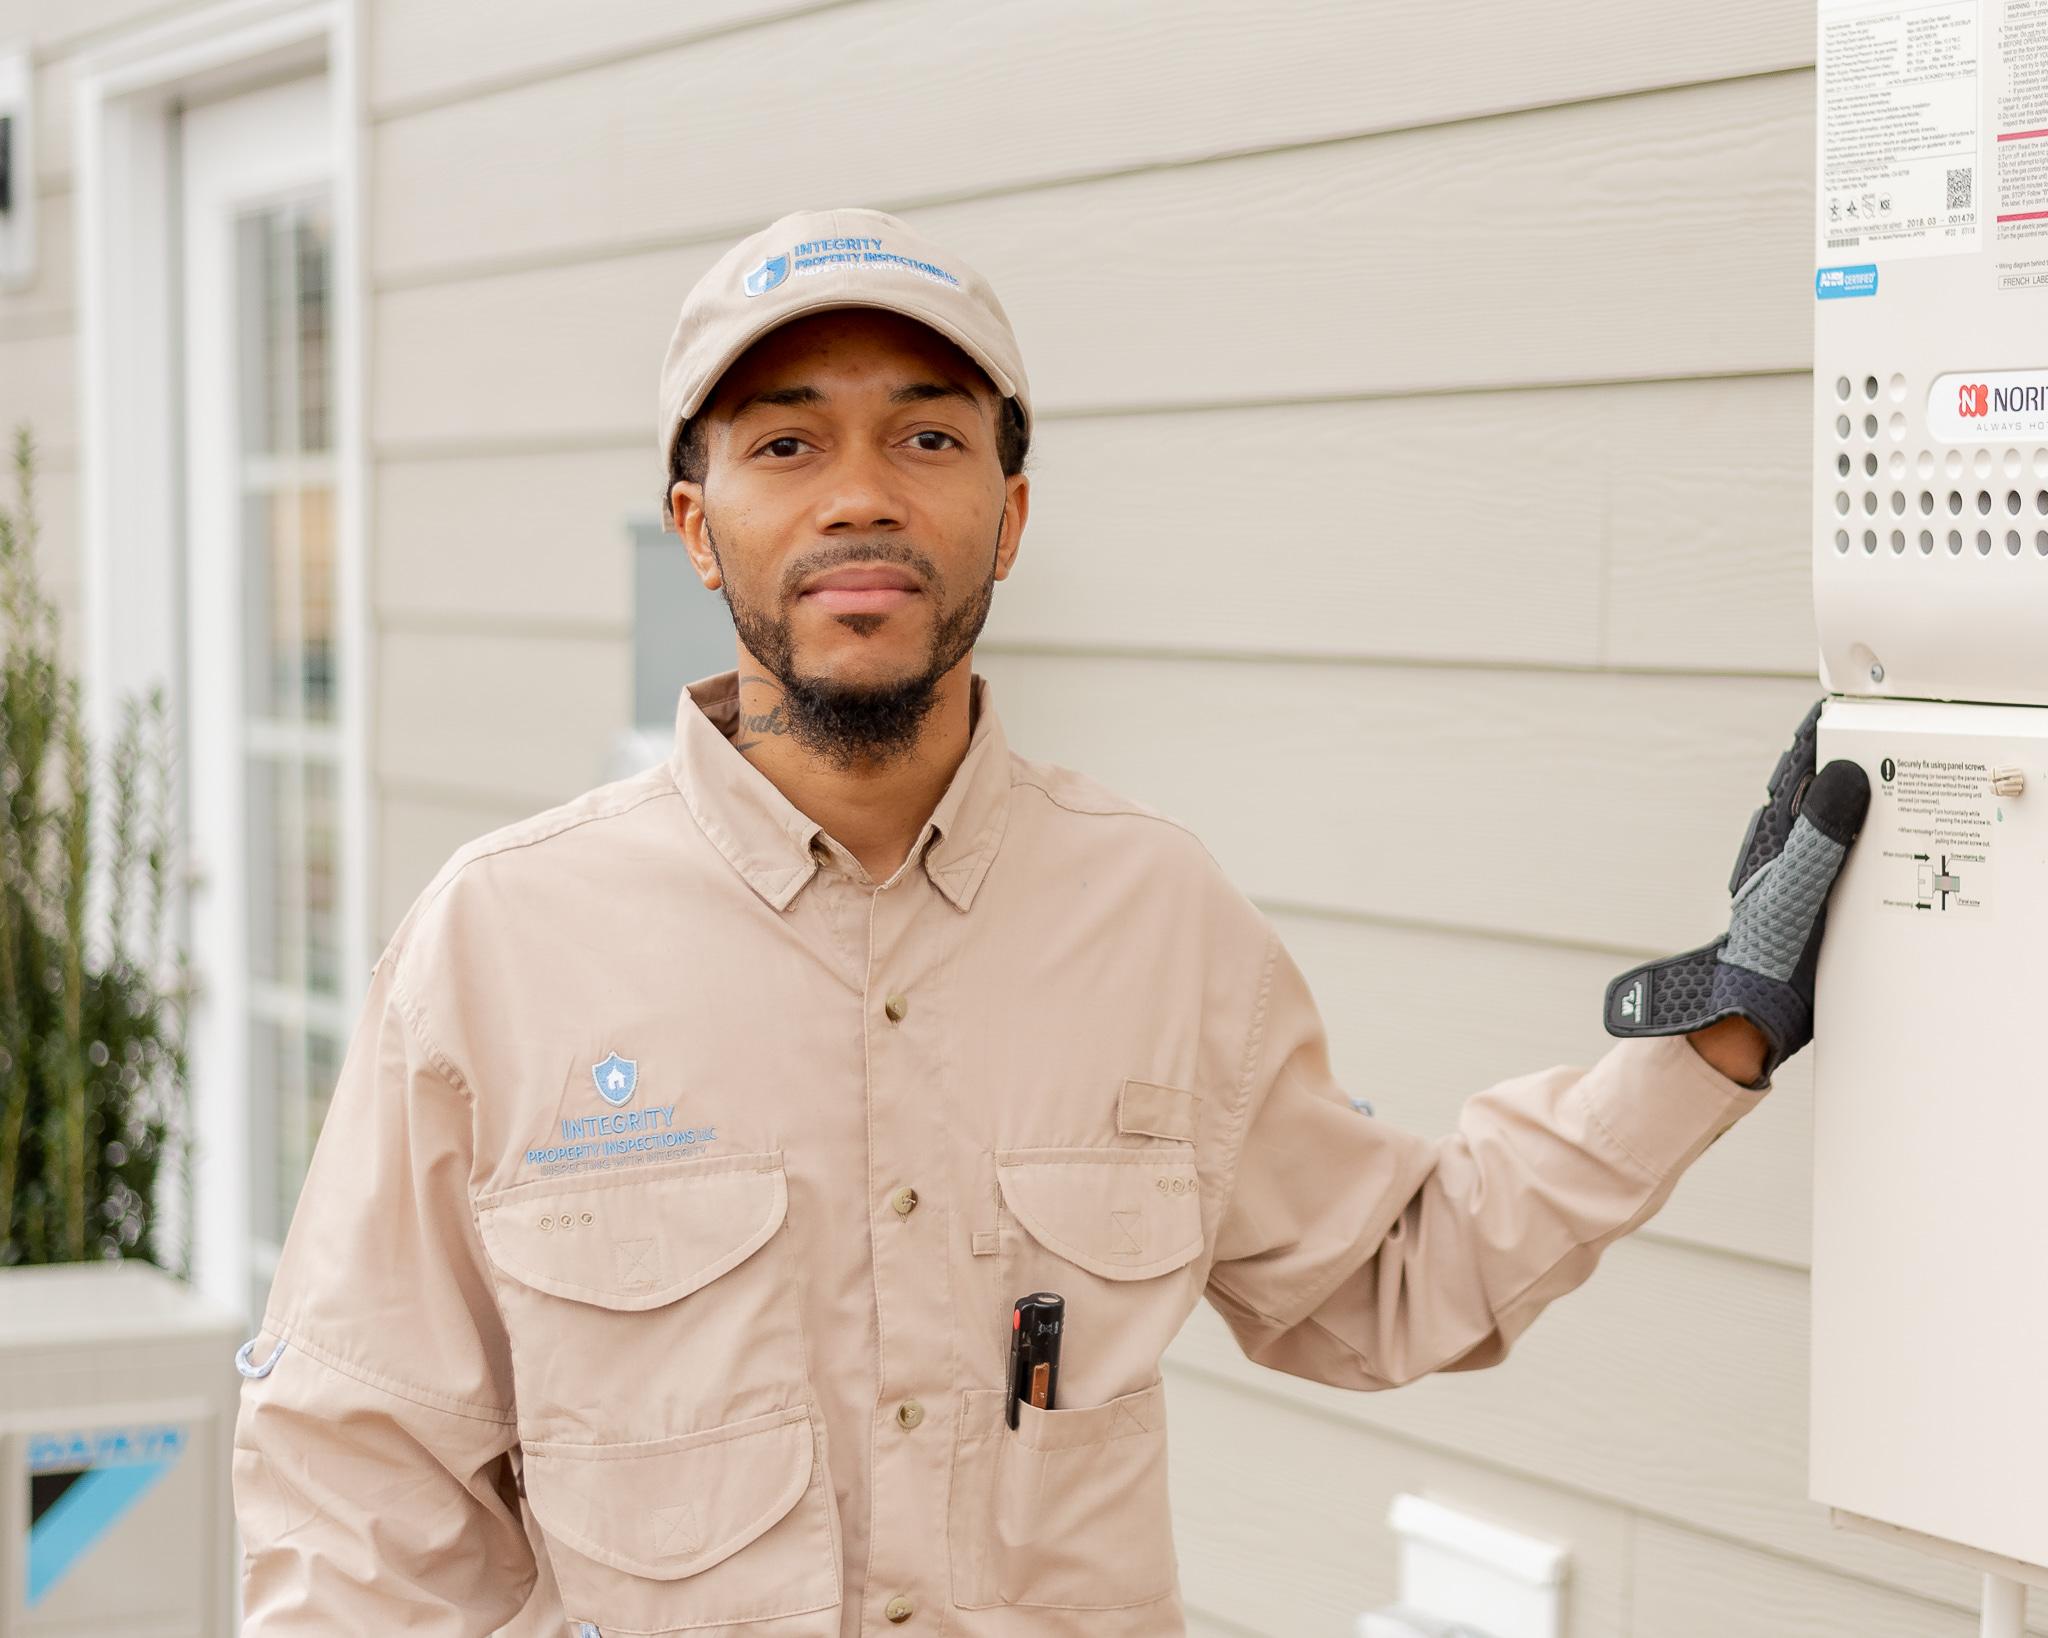 Columbia South Carolina Property Home Inspections Jamil Clark